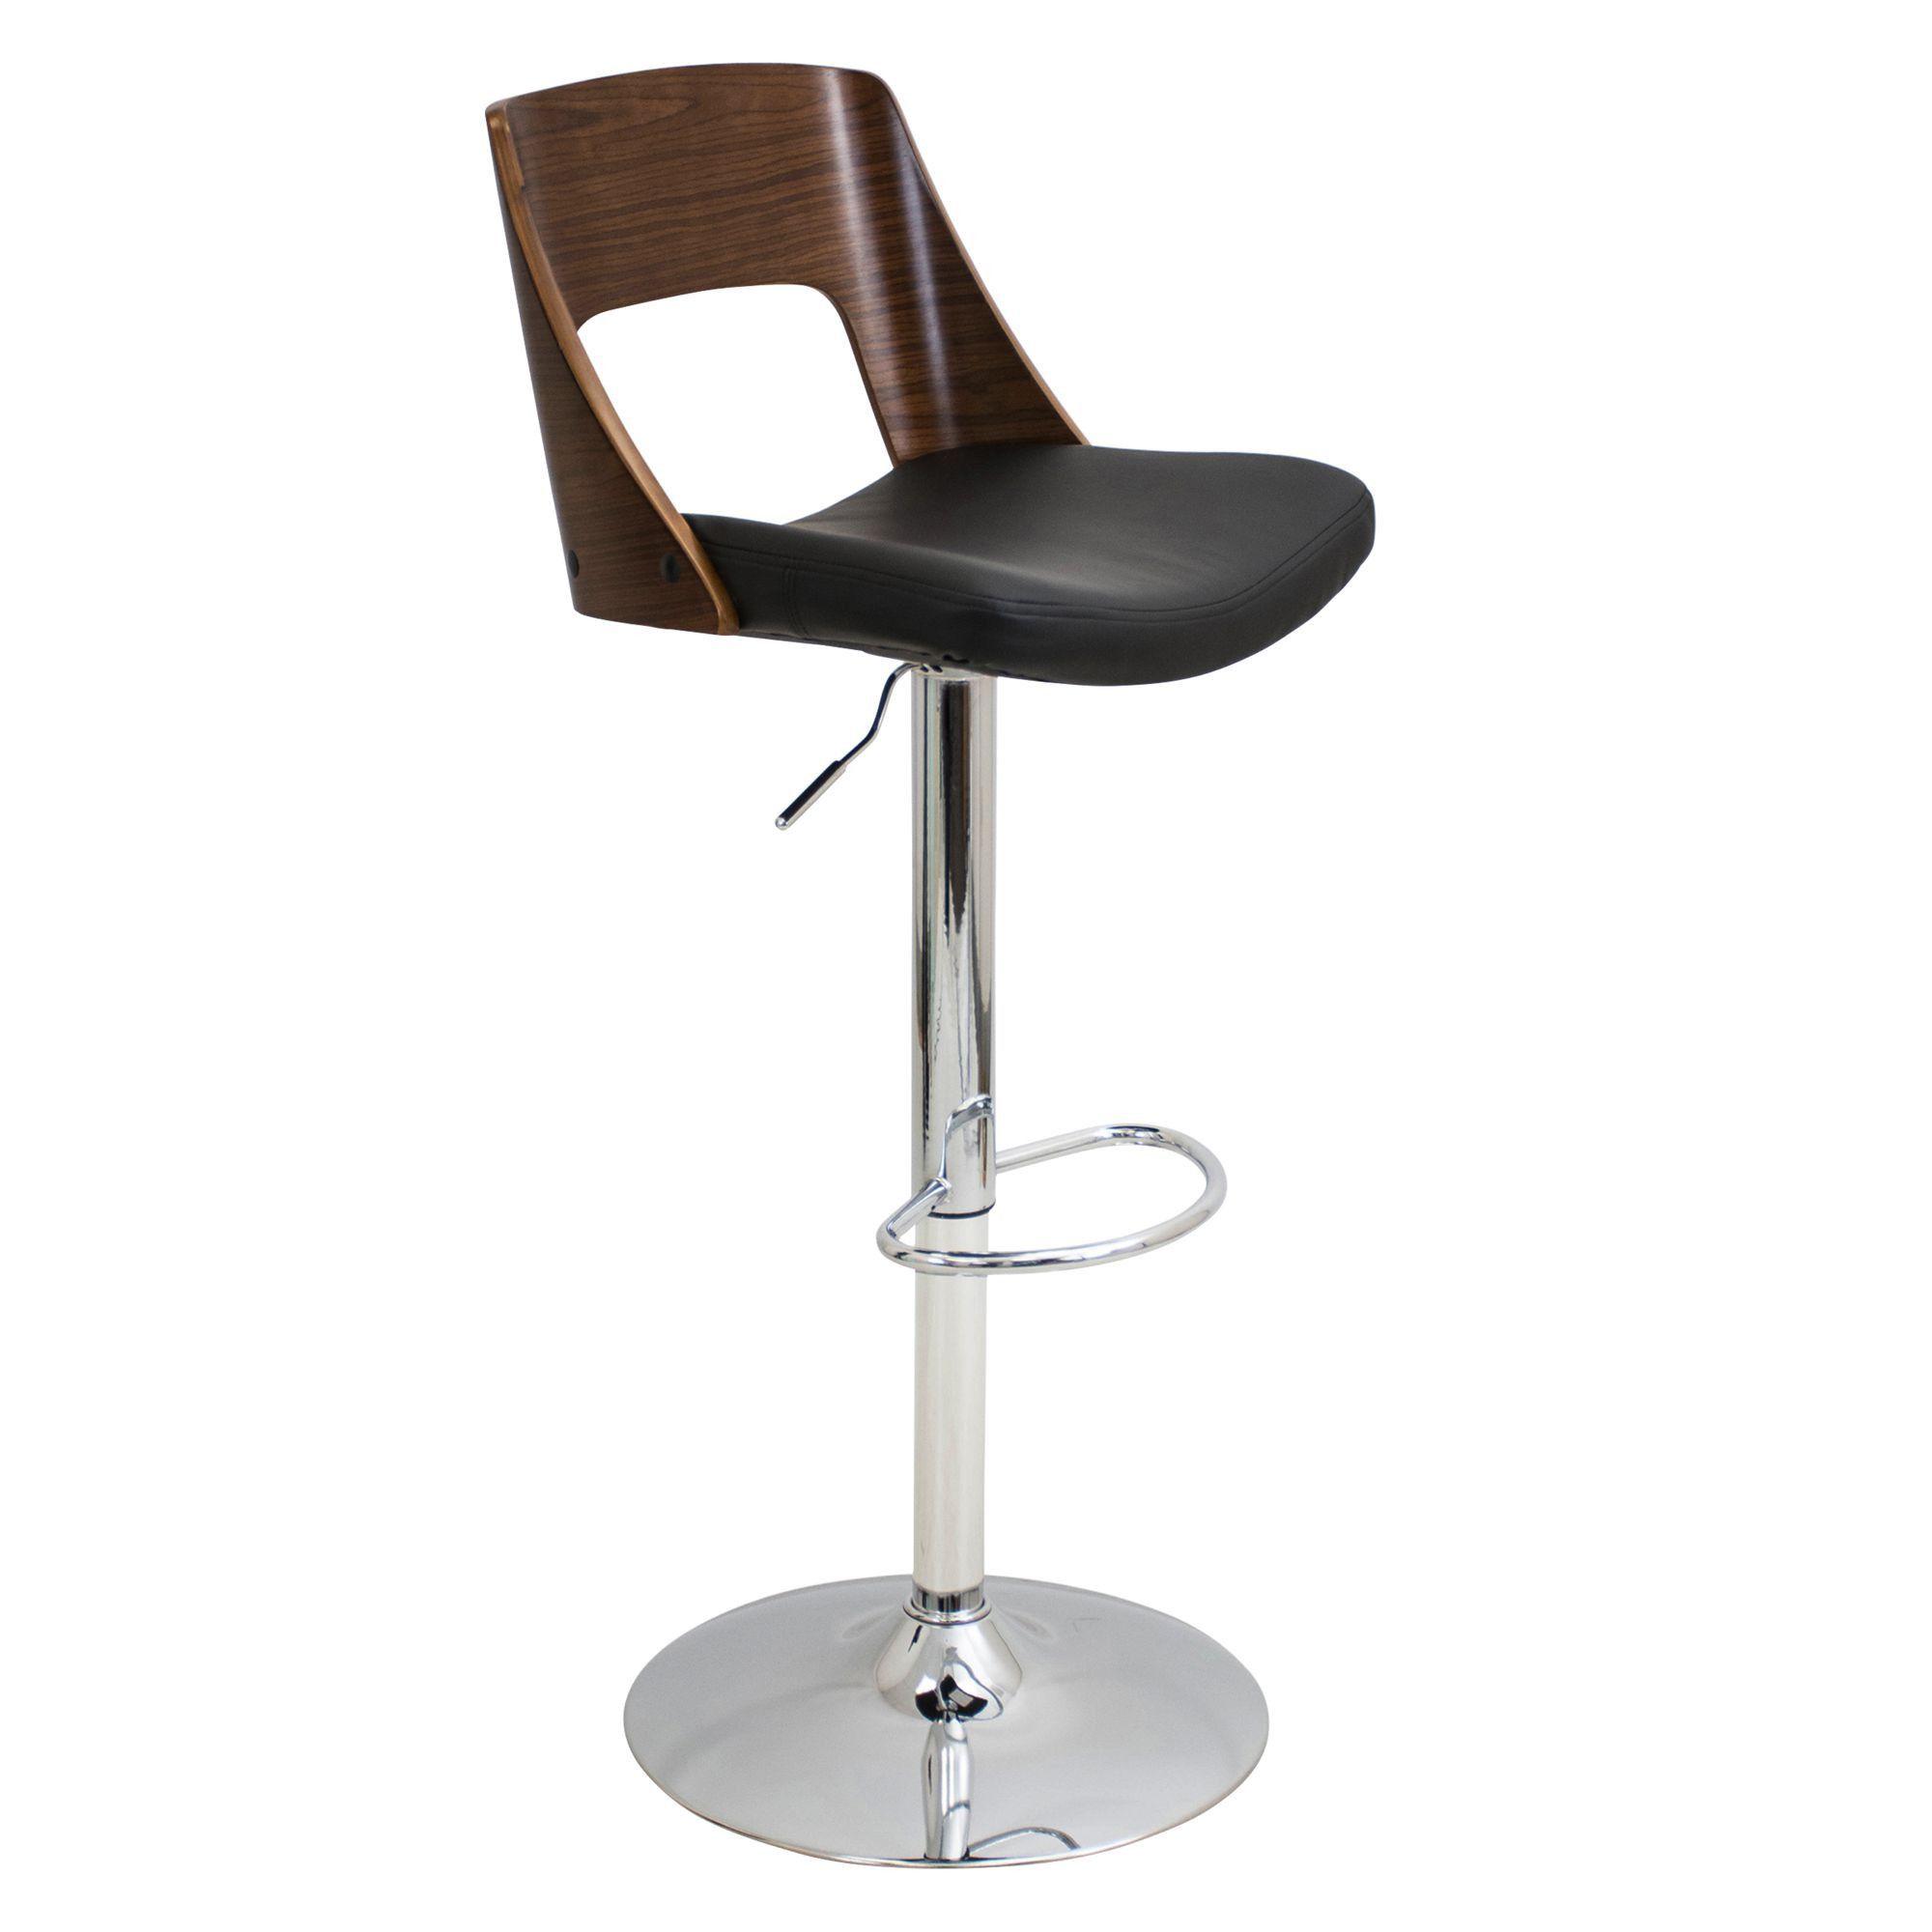 LumiSource Valencia Adjustable Bar Stool | Products | Pinterest